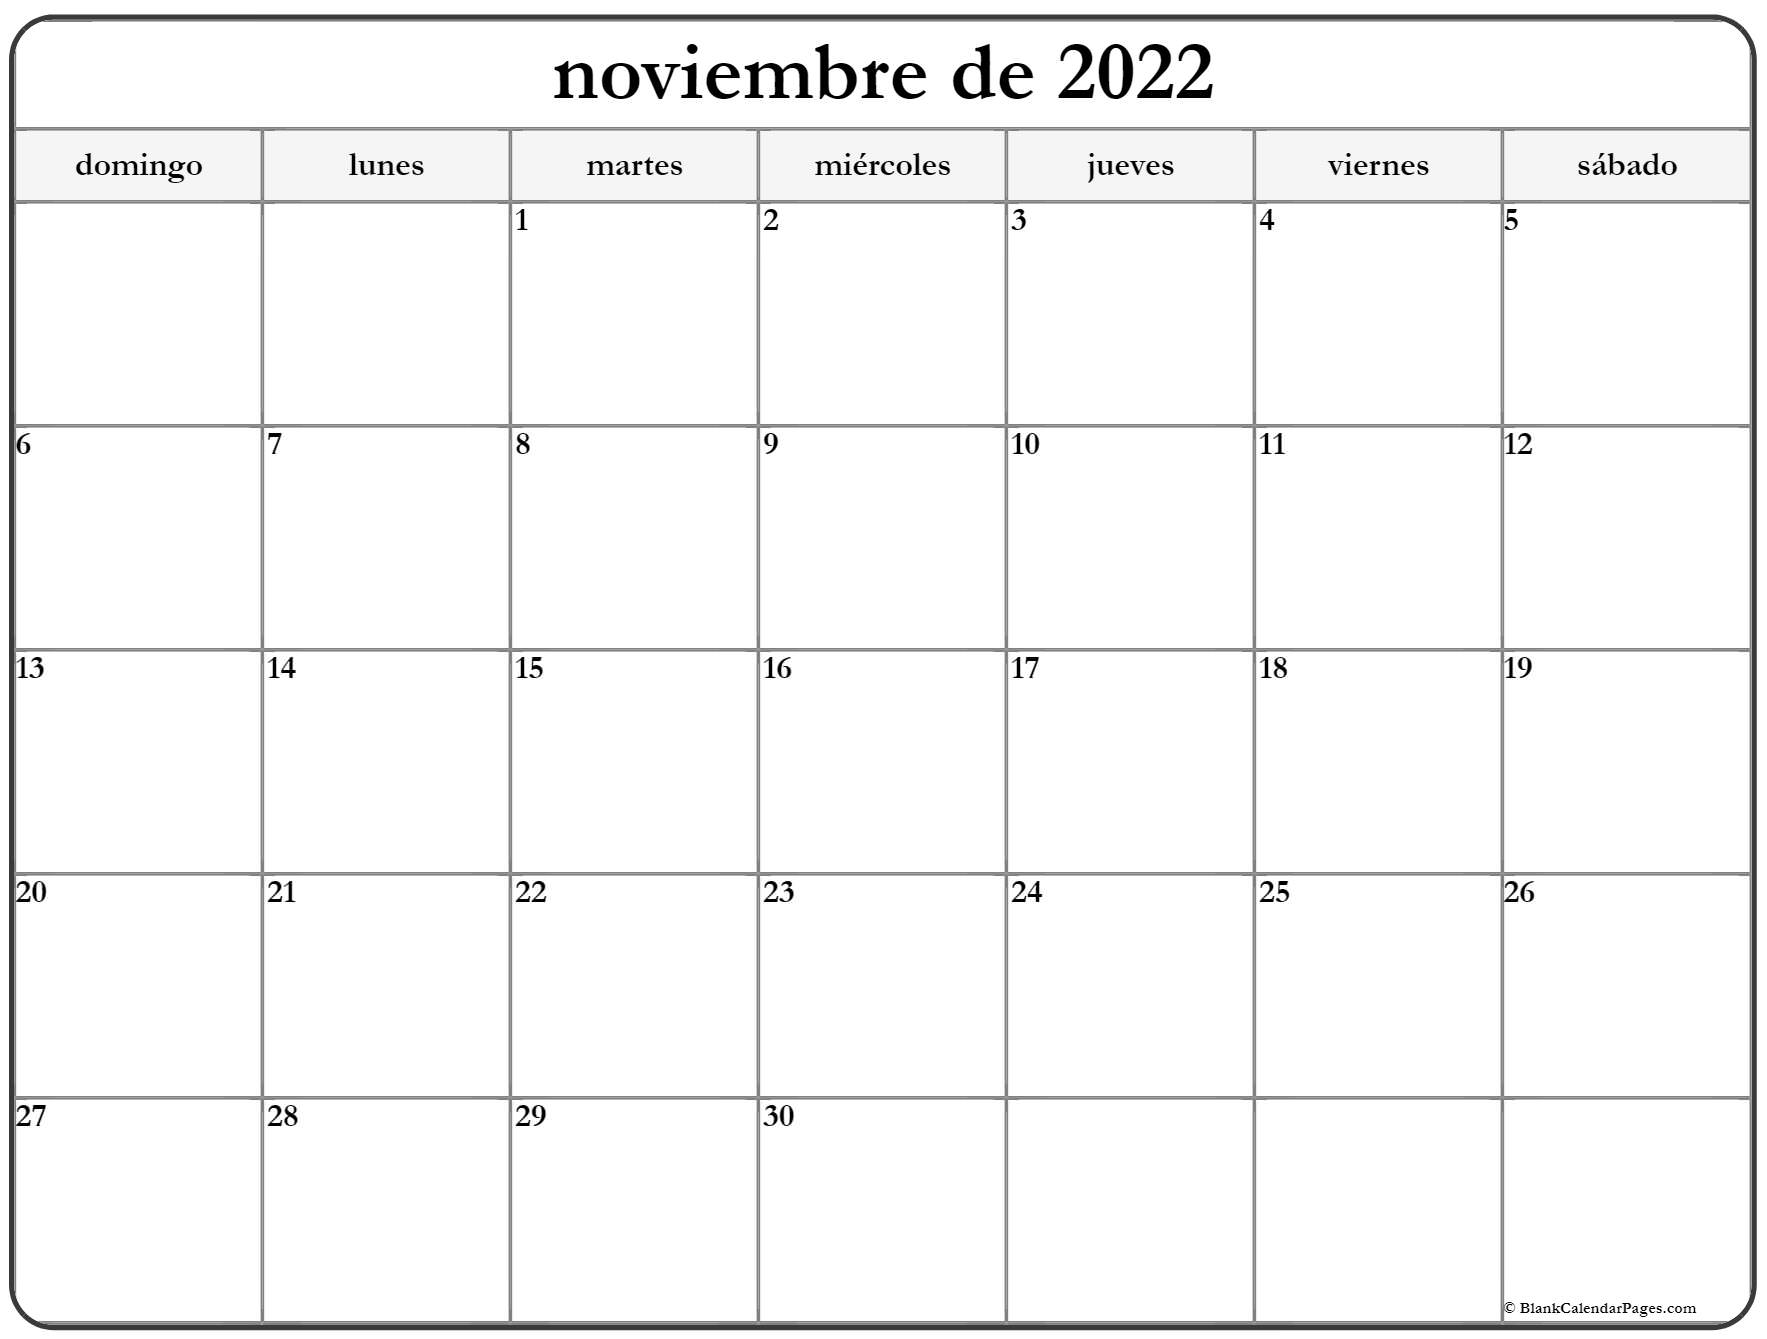 noviembre de 2020 calendrario